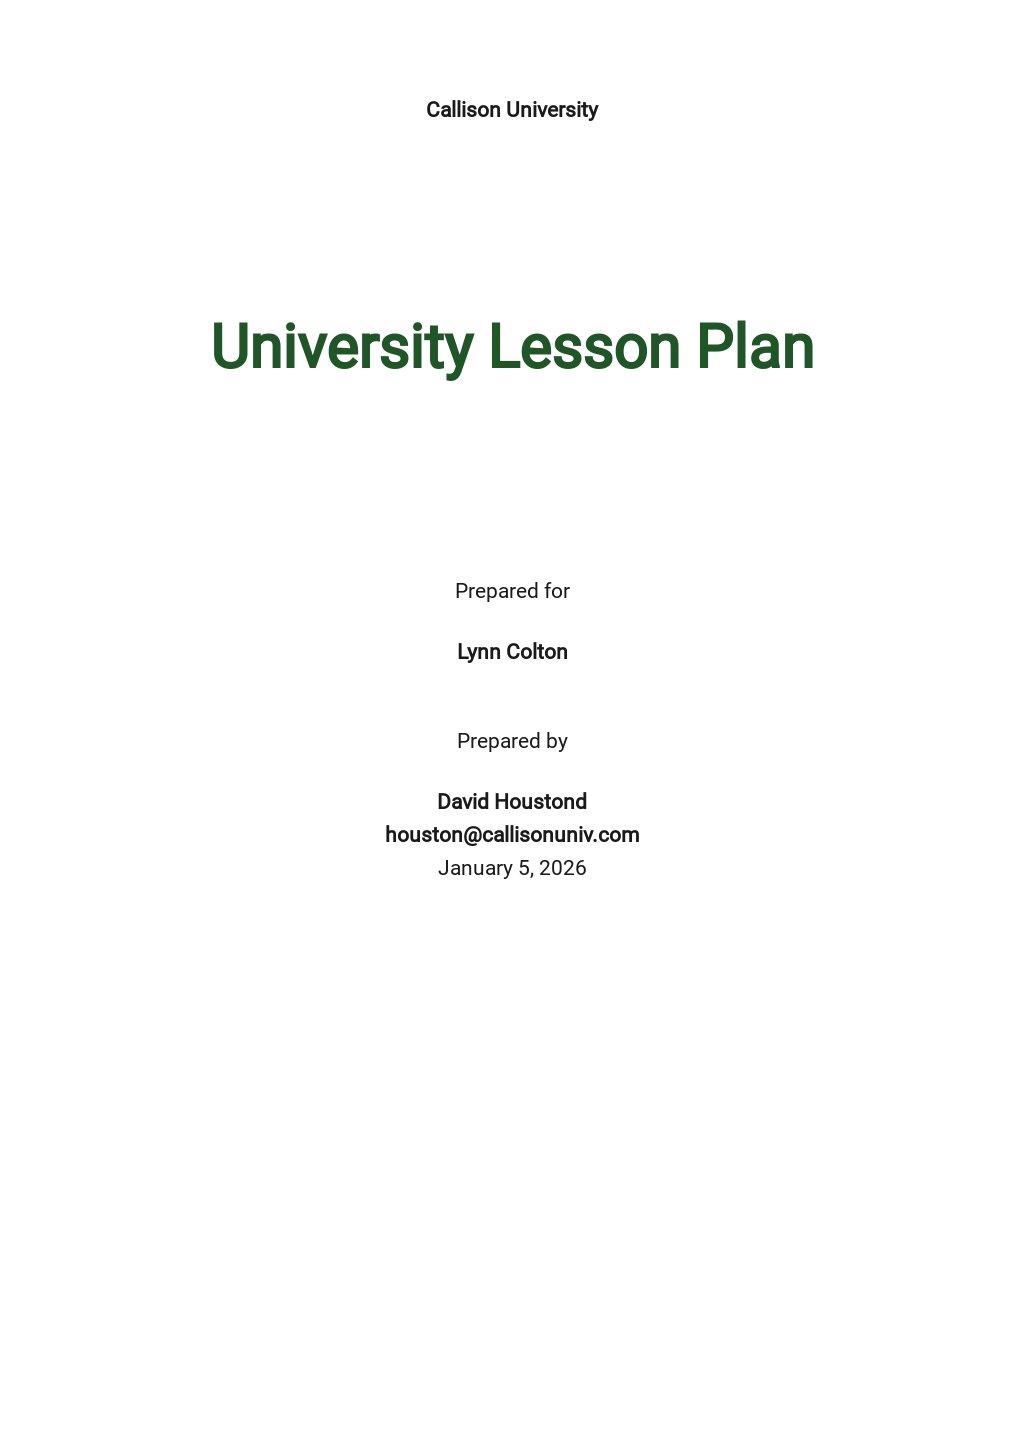 University Lesson Plan Template.jpe